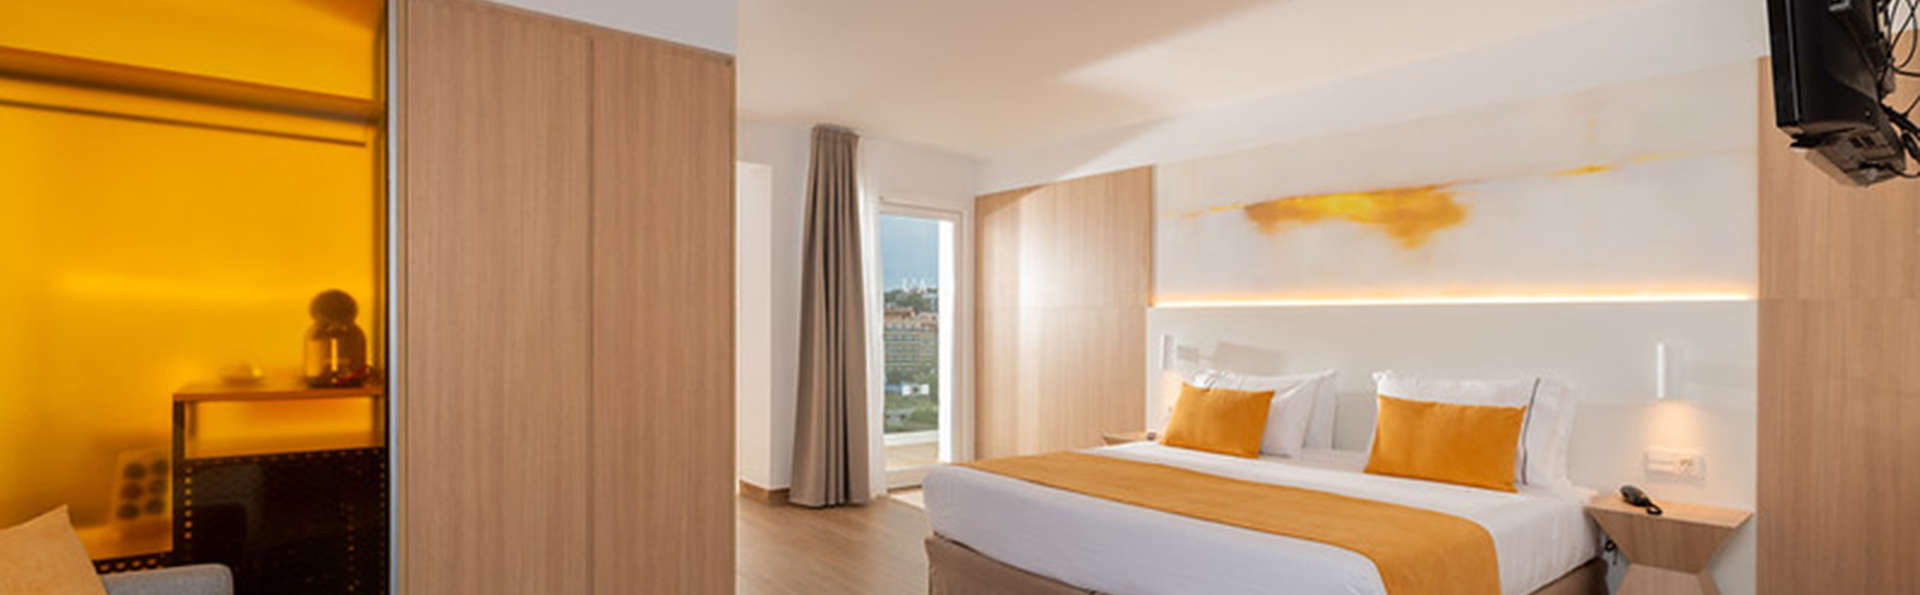 Hotel l'Azure - EDIT_SUPERIOR_3.jpg